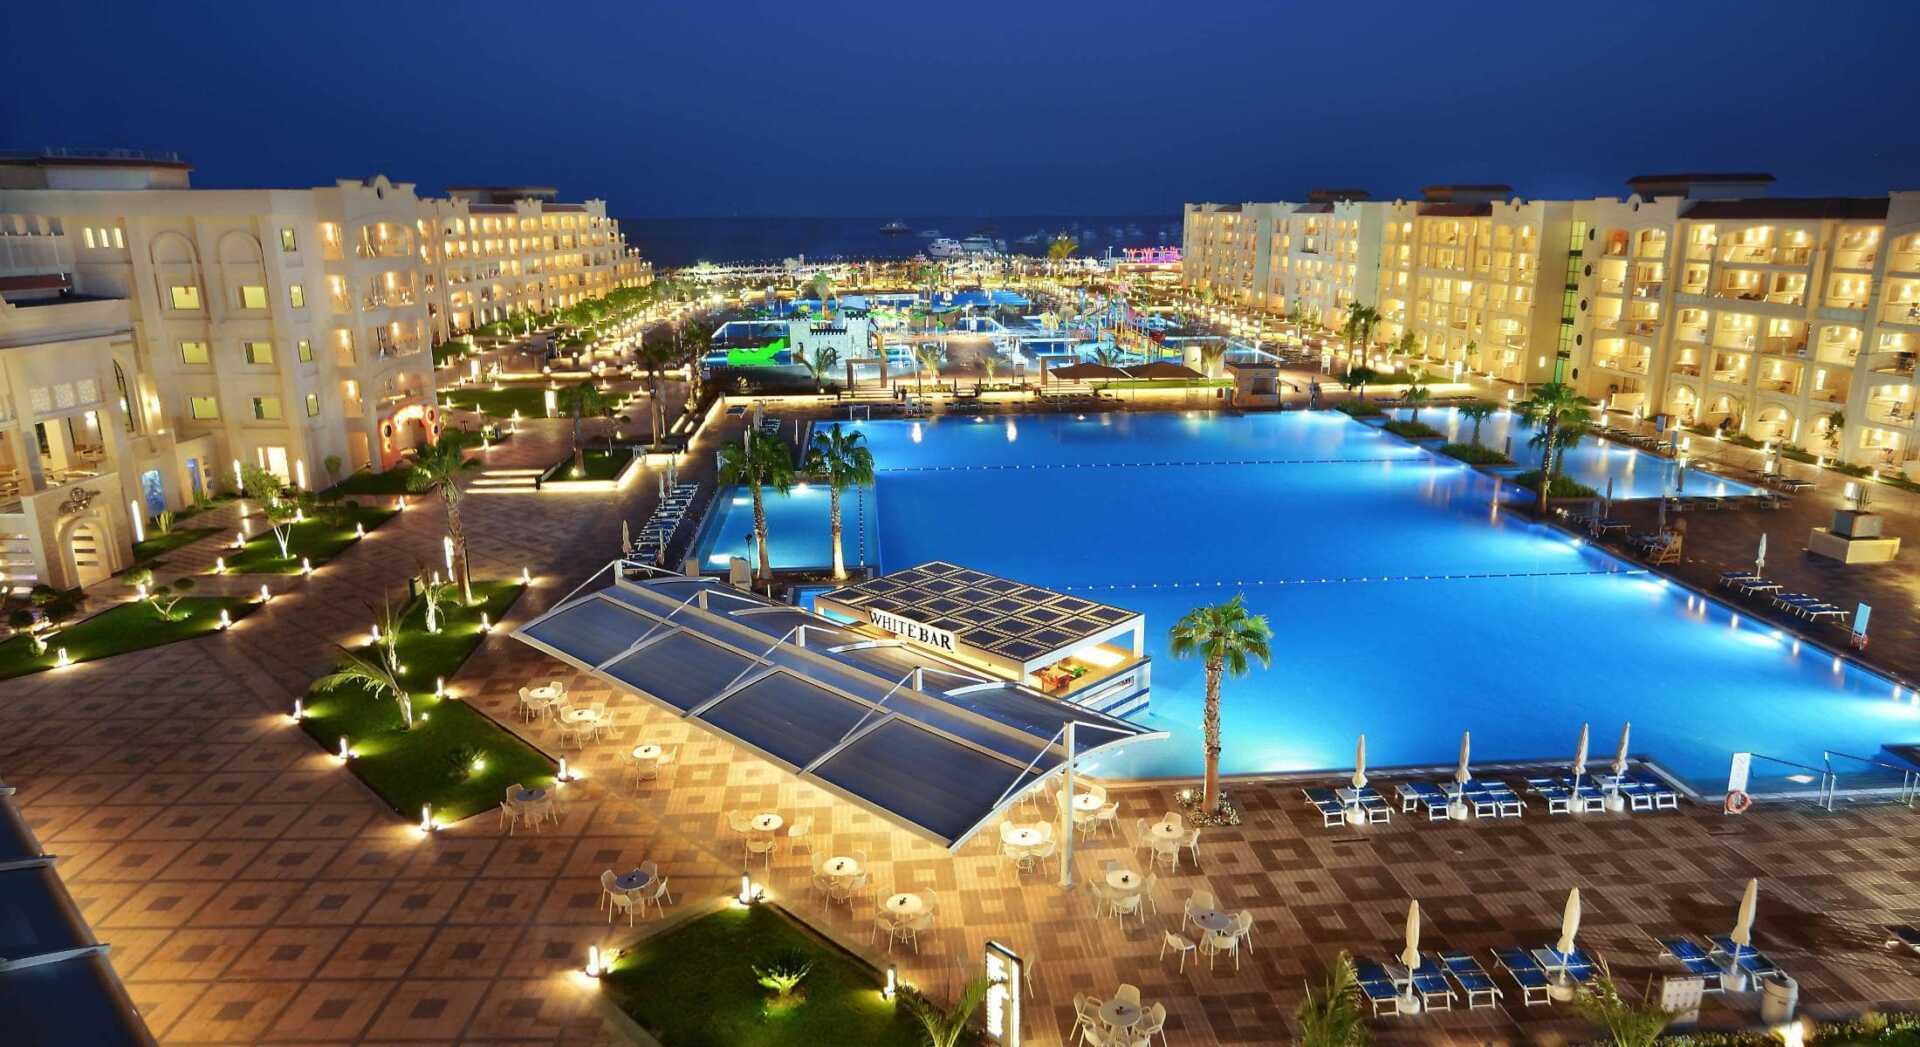 Hotel Abatros White Beach-Hurgada-Jumbo Travel- overview